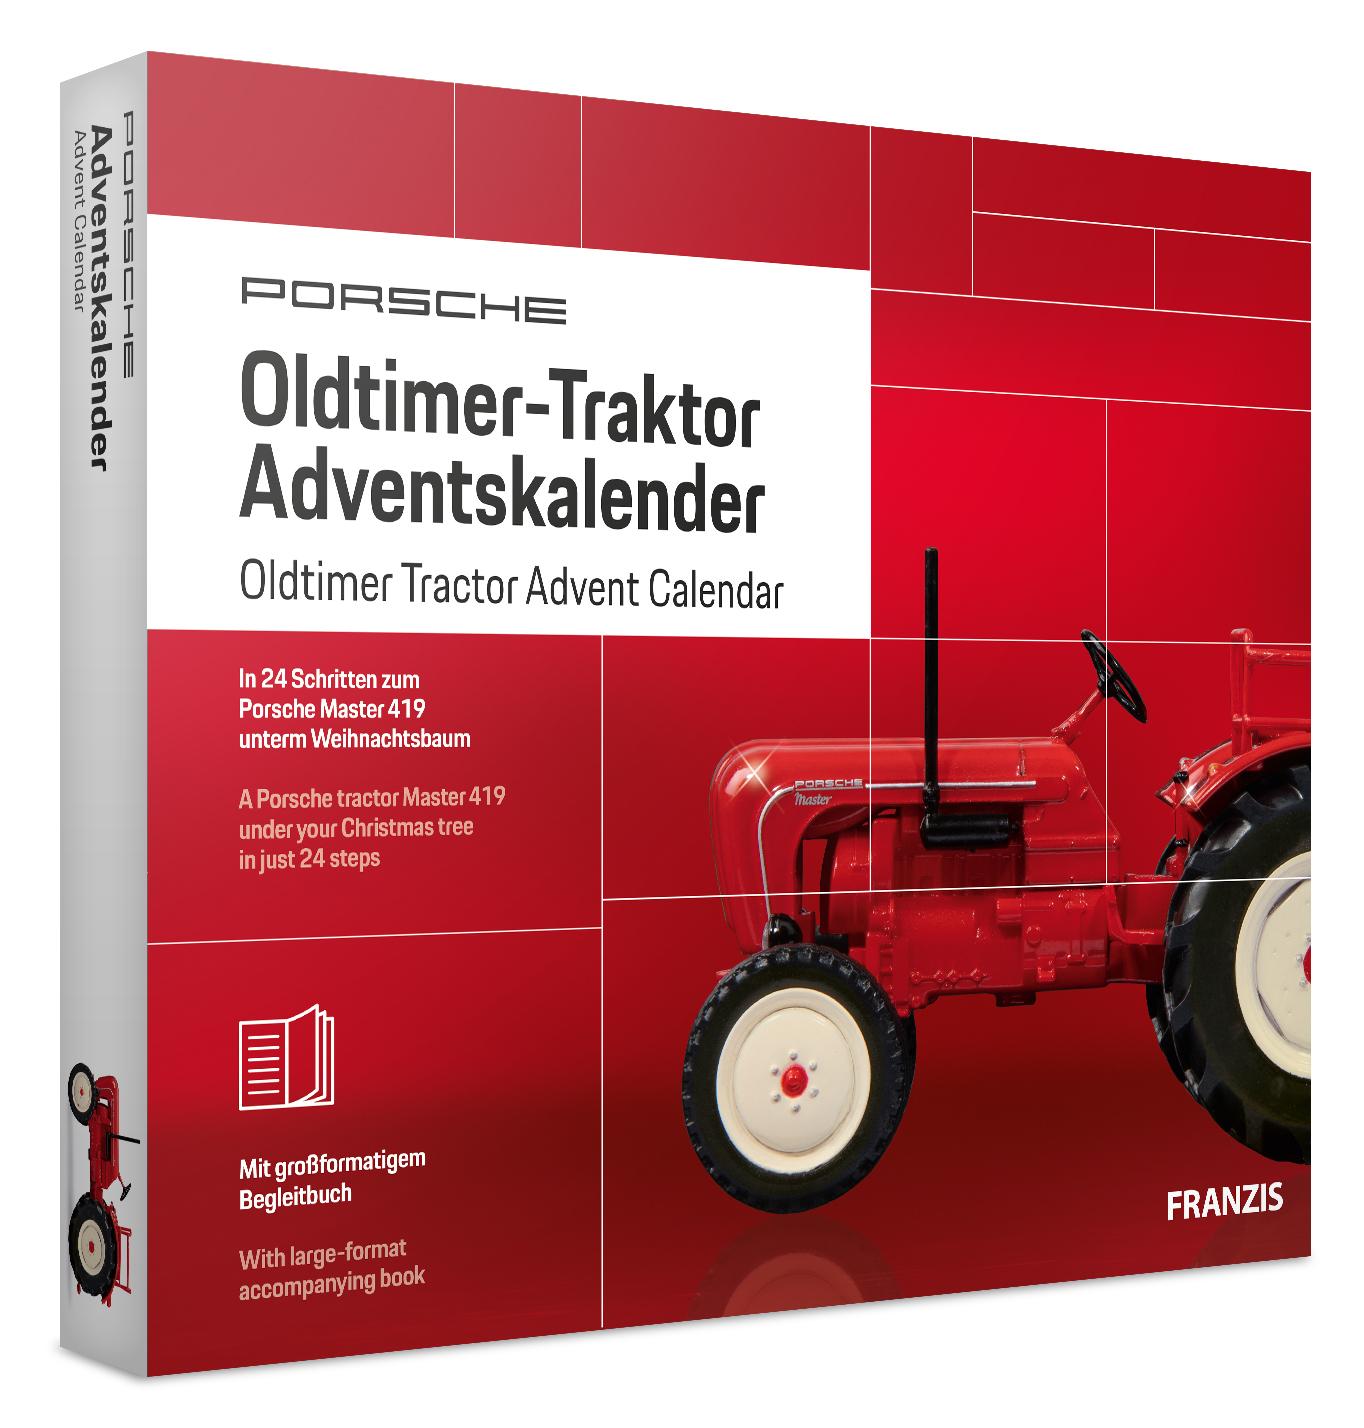 Adventskalender Oldtimer Traktor